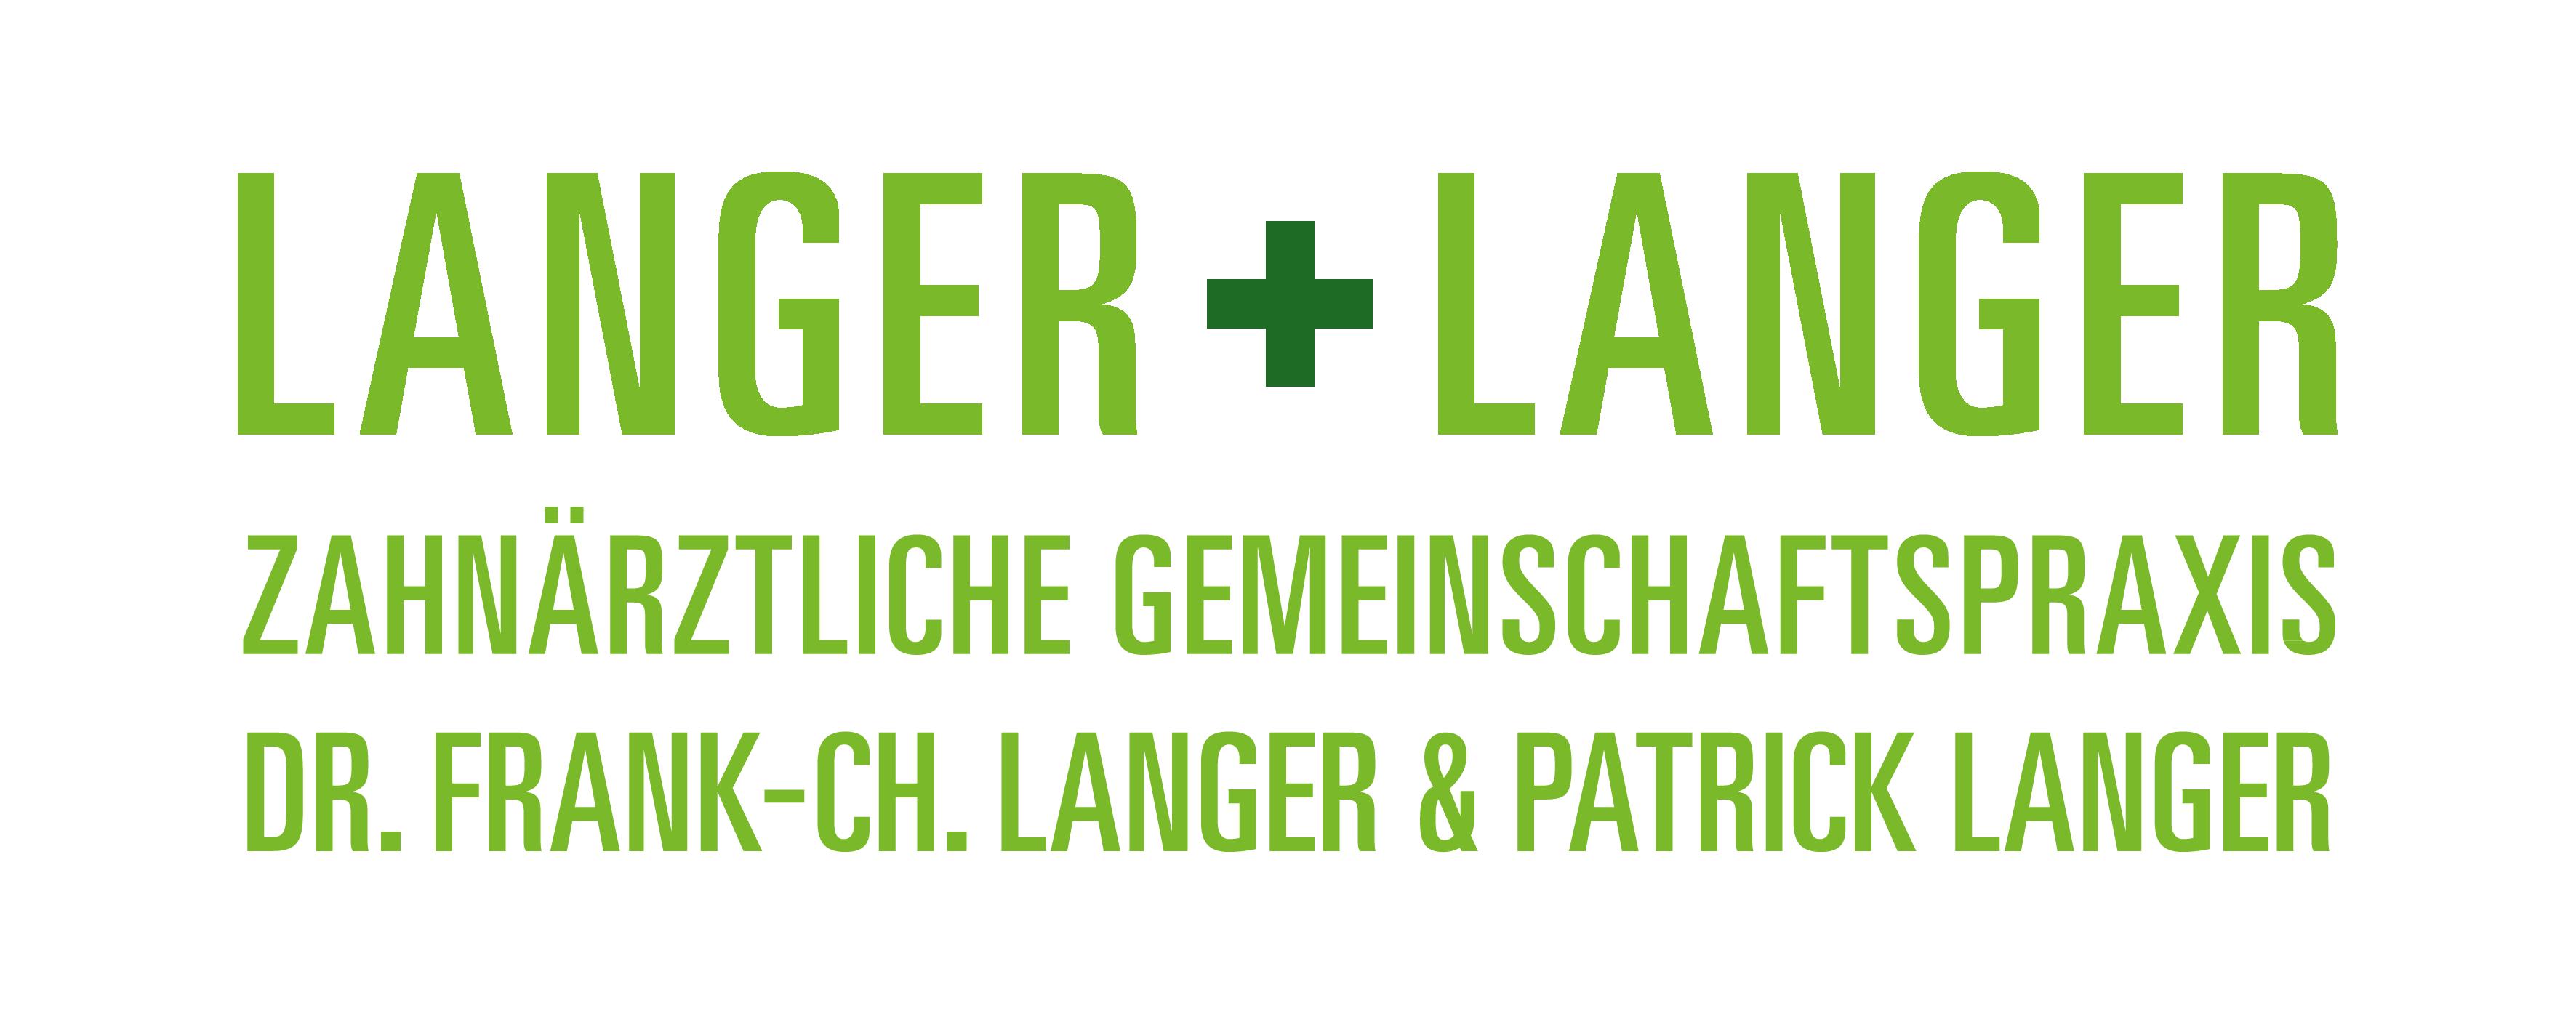 Zahnärztliche Gemeinschaftspraxis Langer+Langer